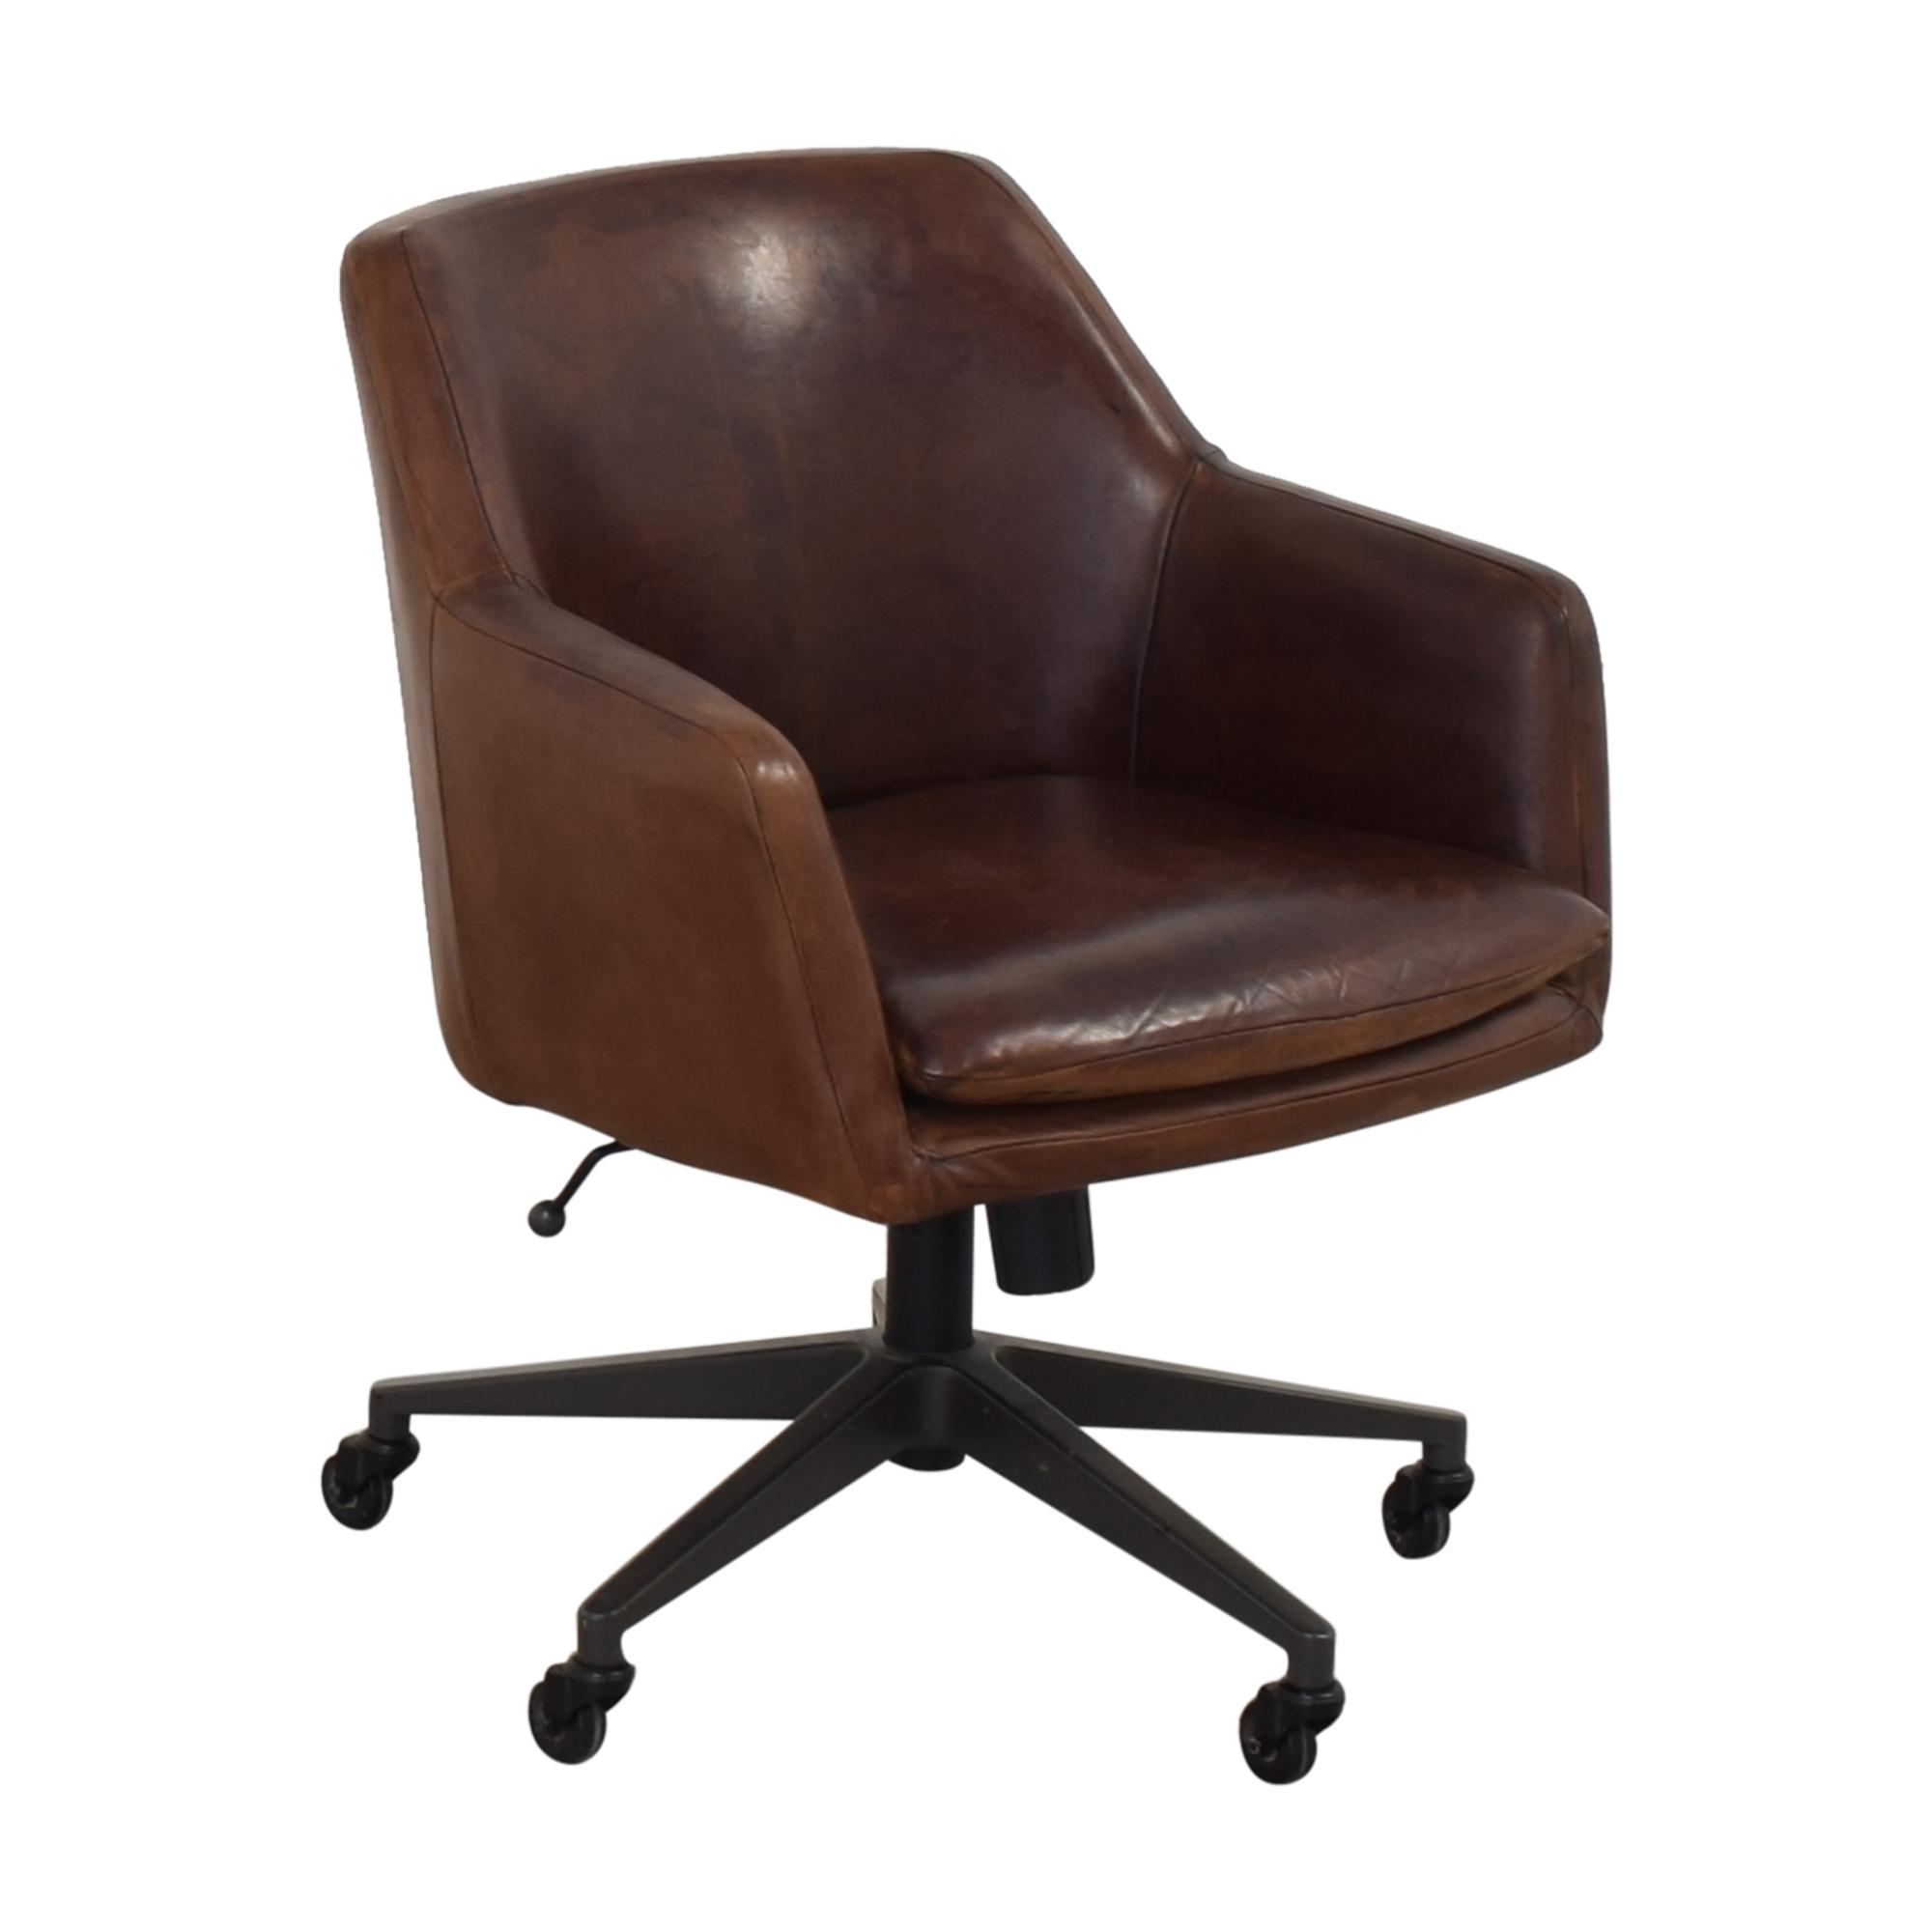 shop West Elm West Elm Helvatica Leather Office Chair online